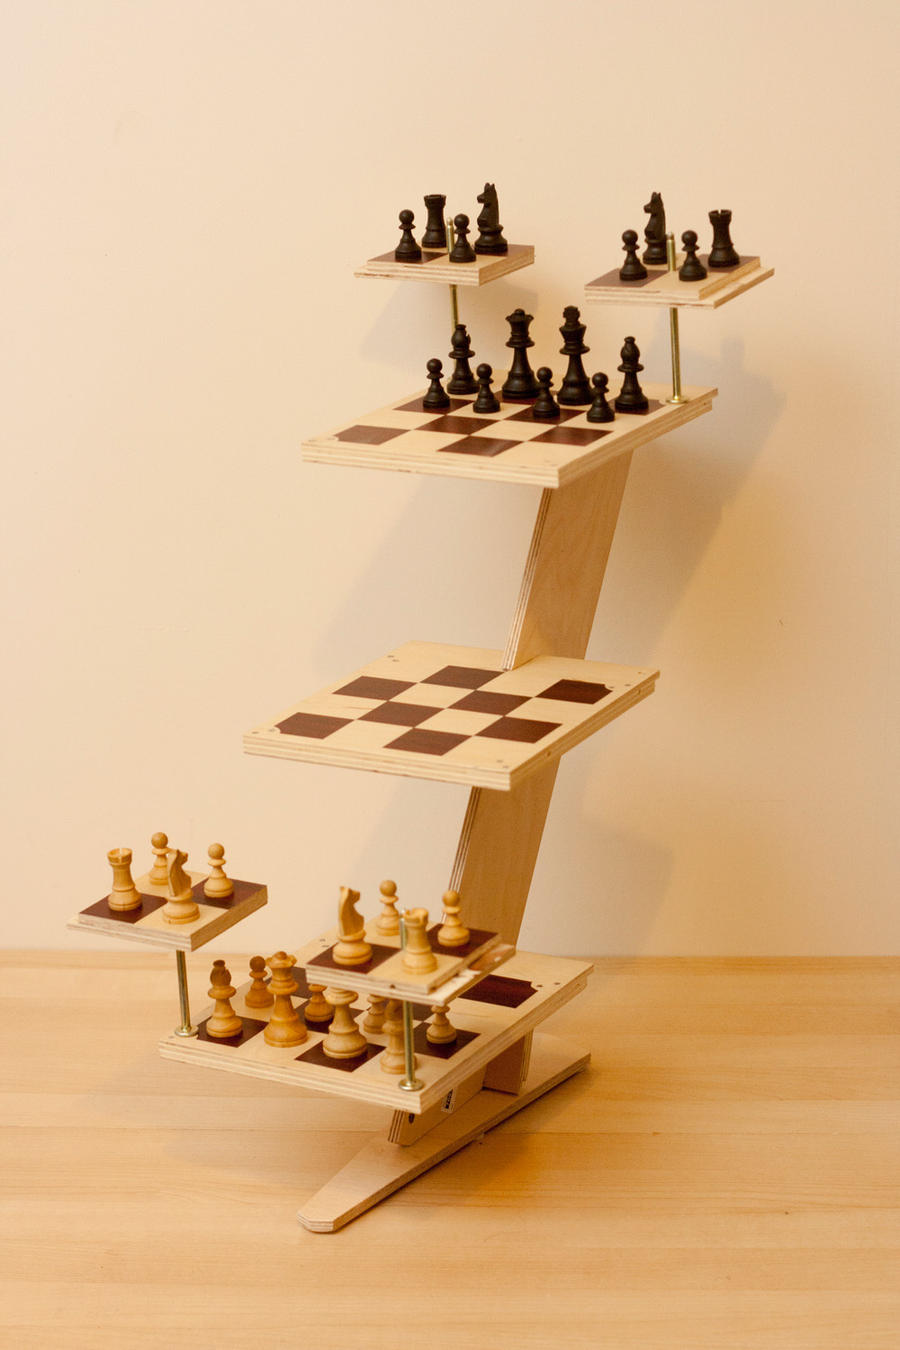 3d Chess Set By Gmjhowe On Deviantart